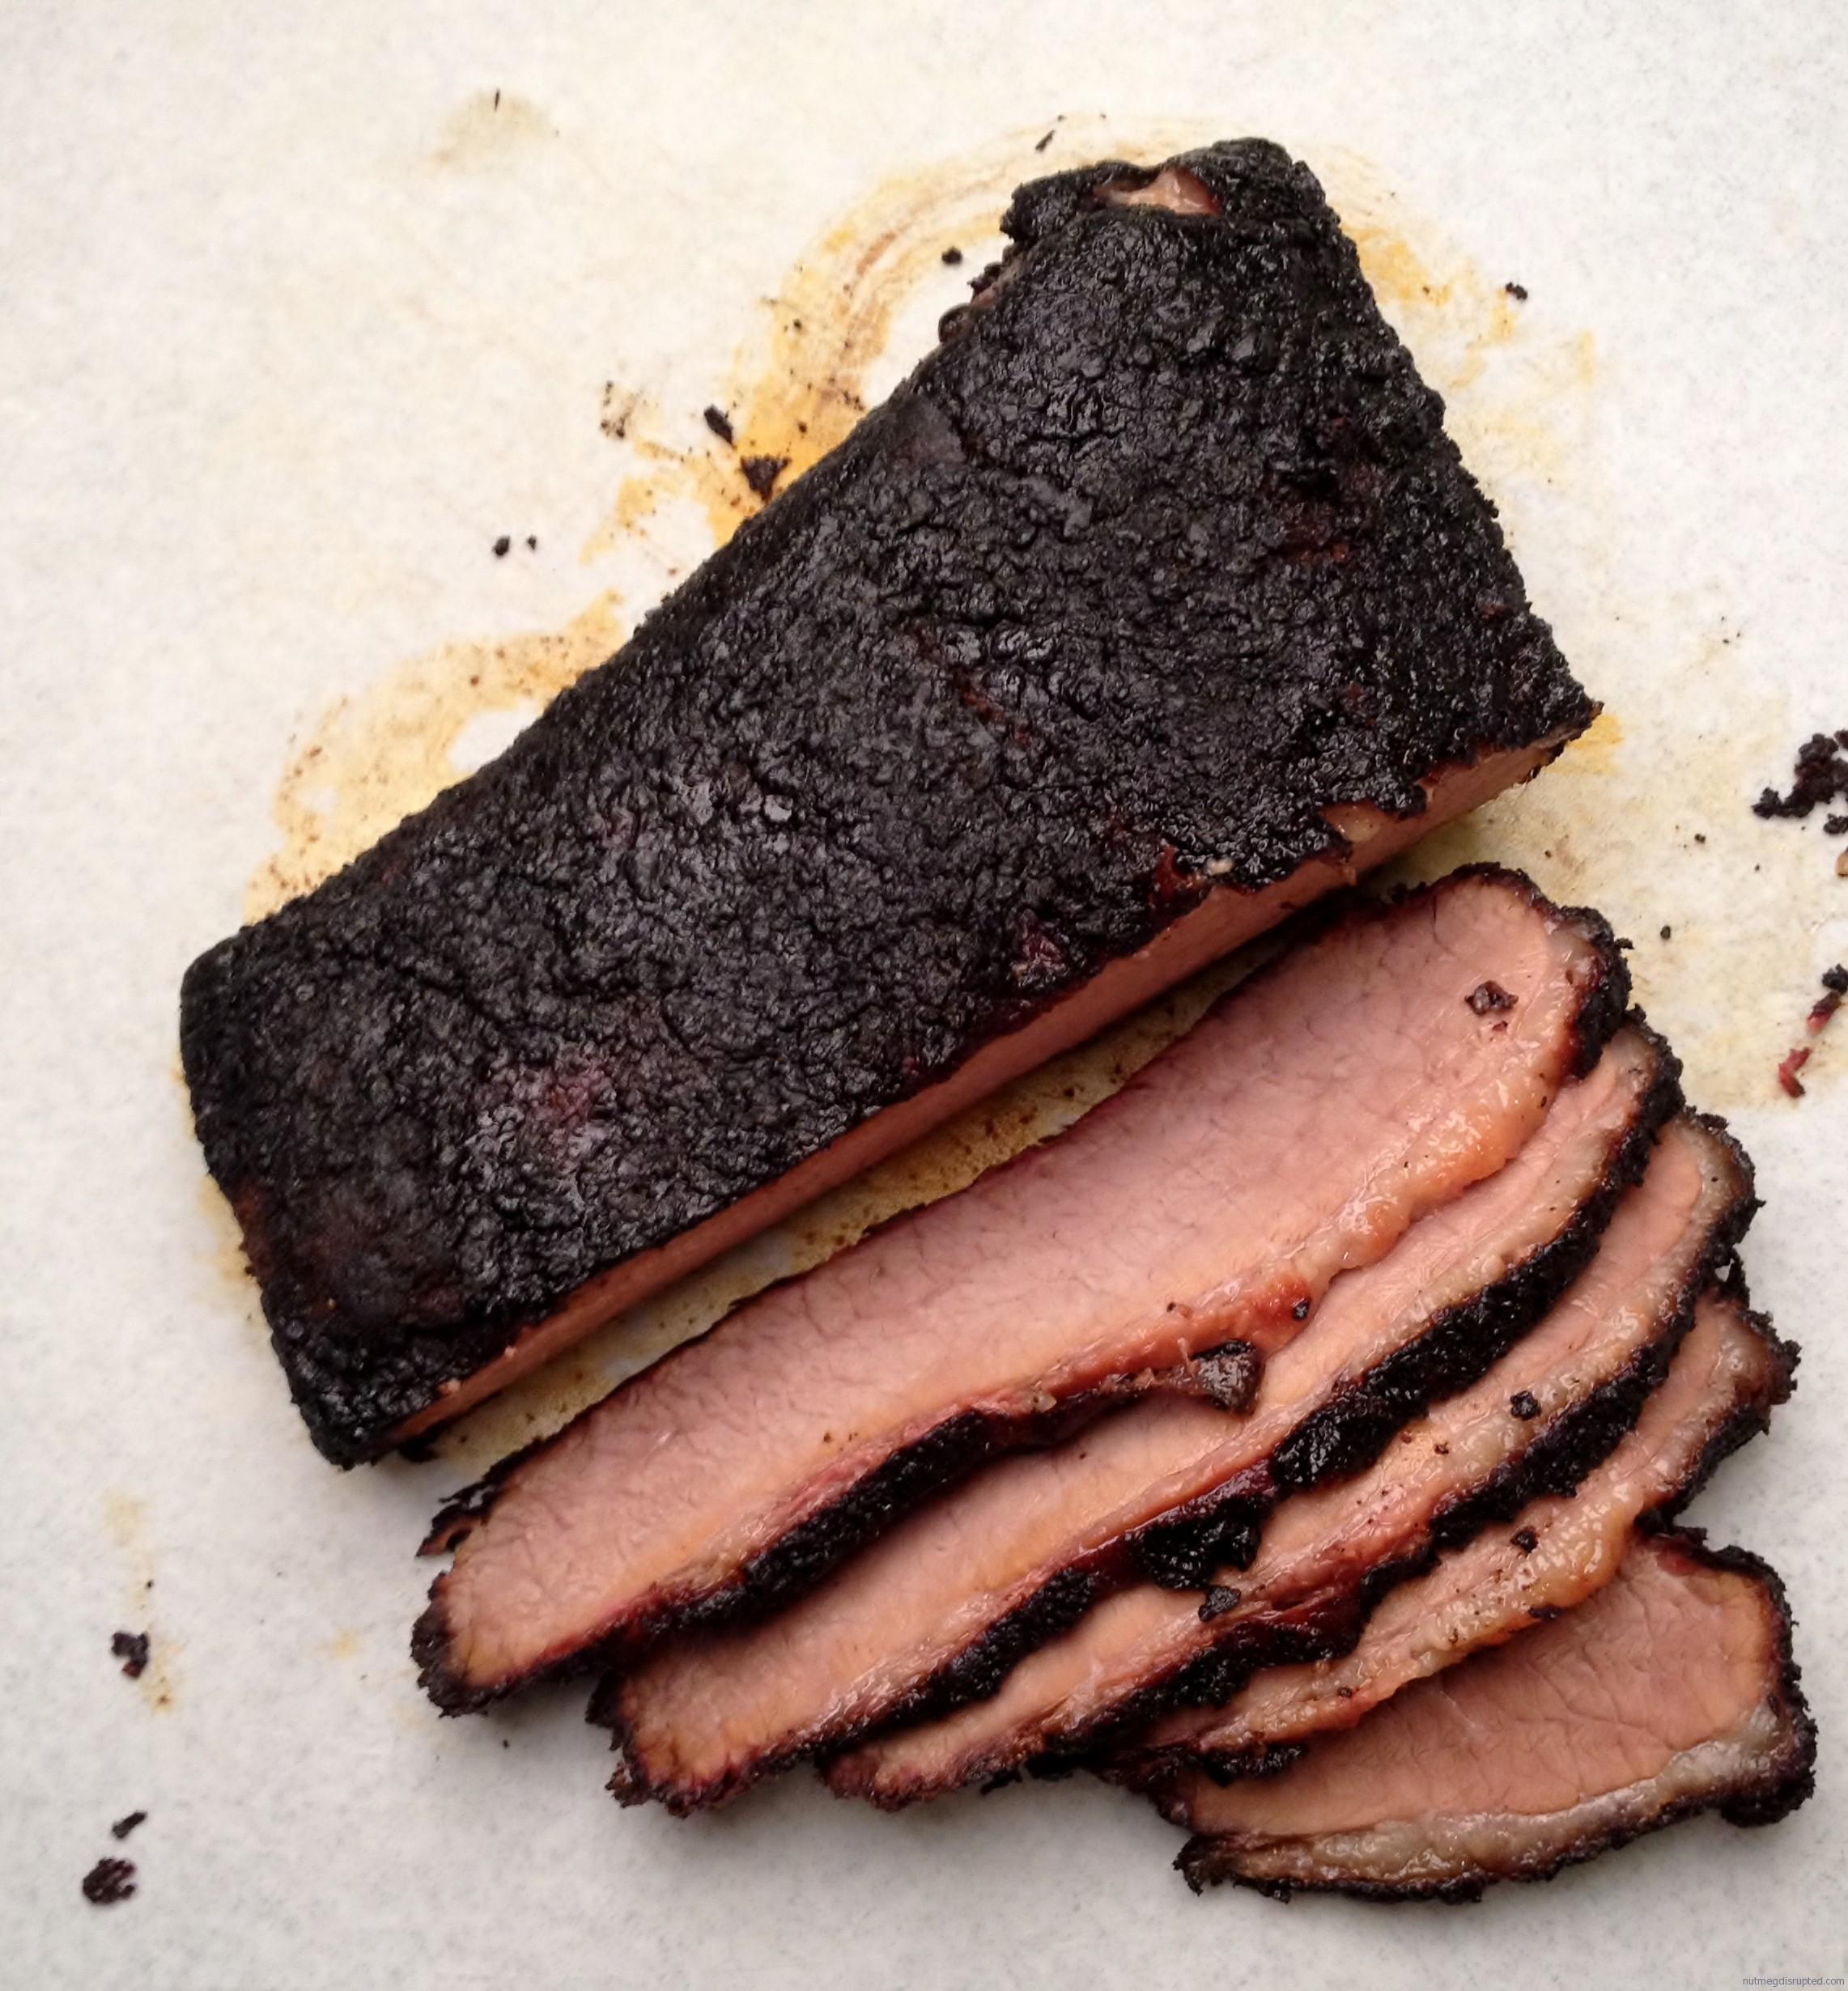 Smoked Beef Brisket  18 hour Slow Smoked Beef Brisket